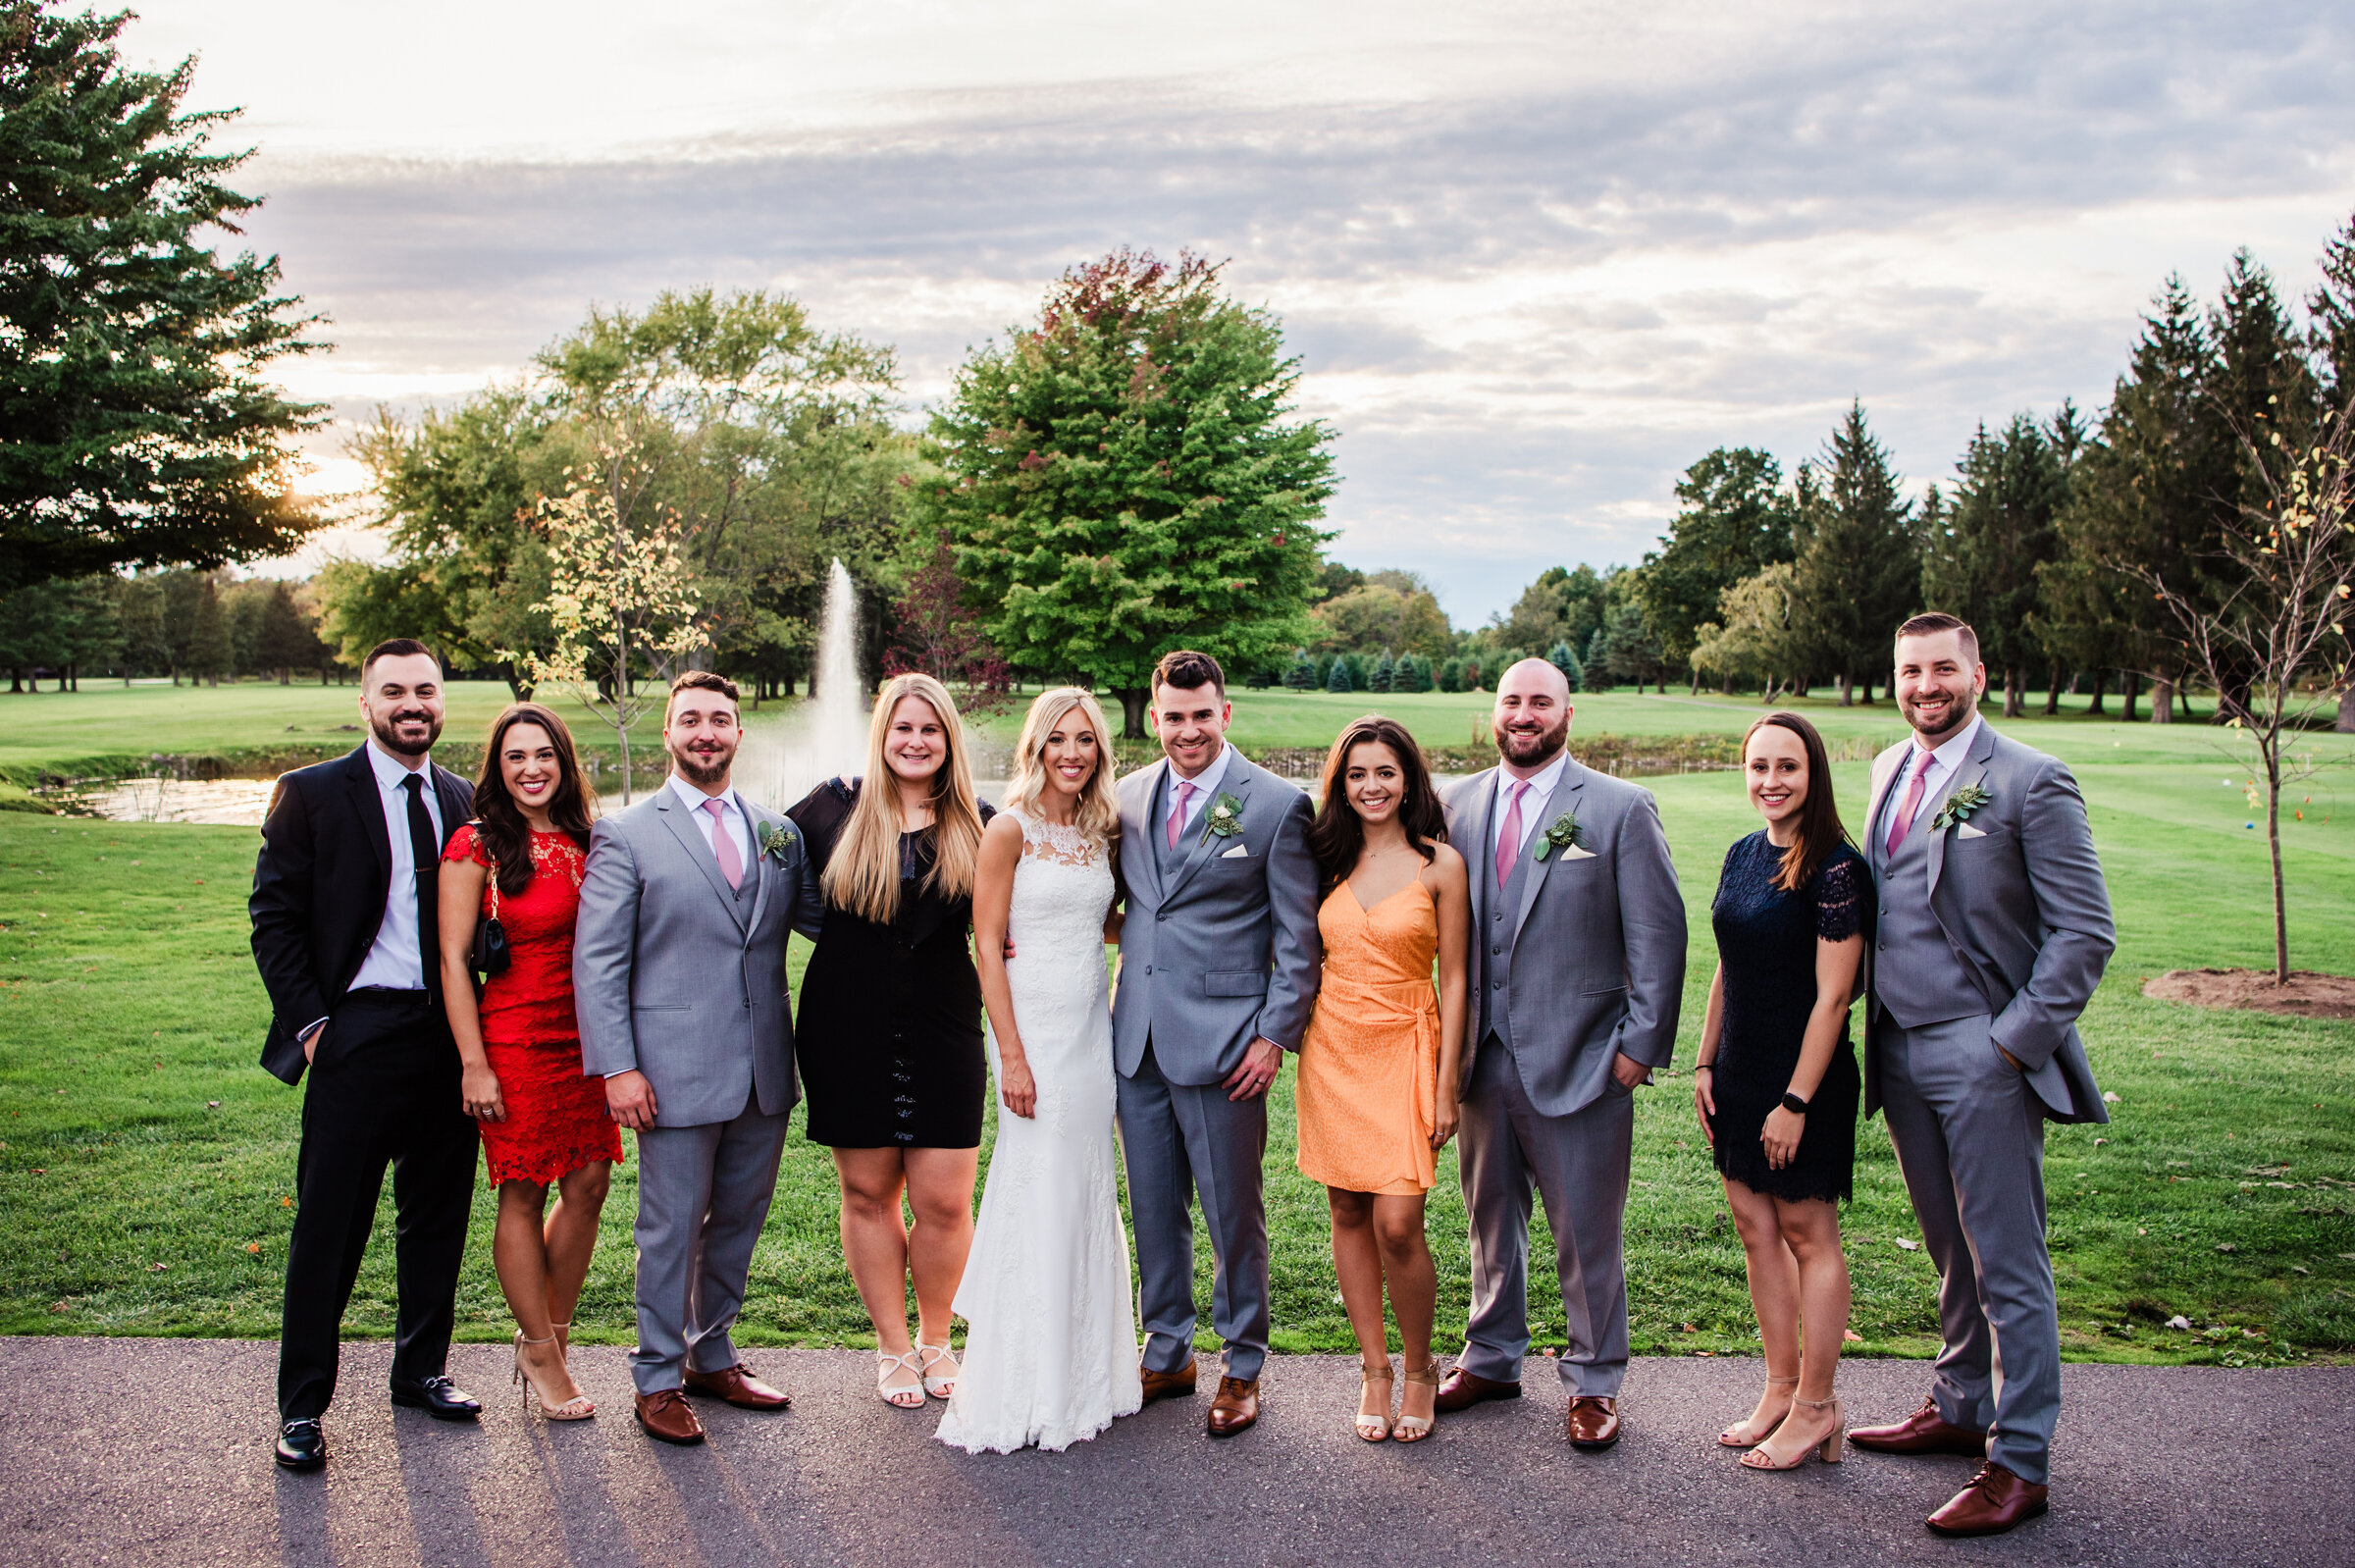 Deerfield_Country_Club_Rochester_Wedding_JILL_STUDIO_Rochester_NY_Photographer_DSC_6995.jpg